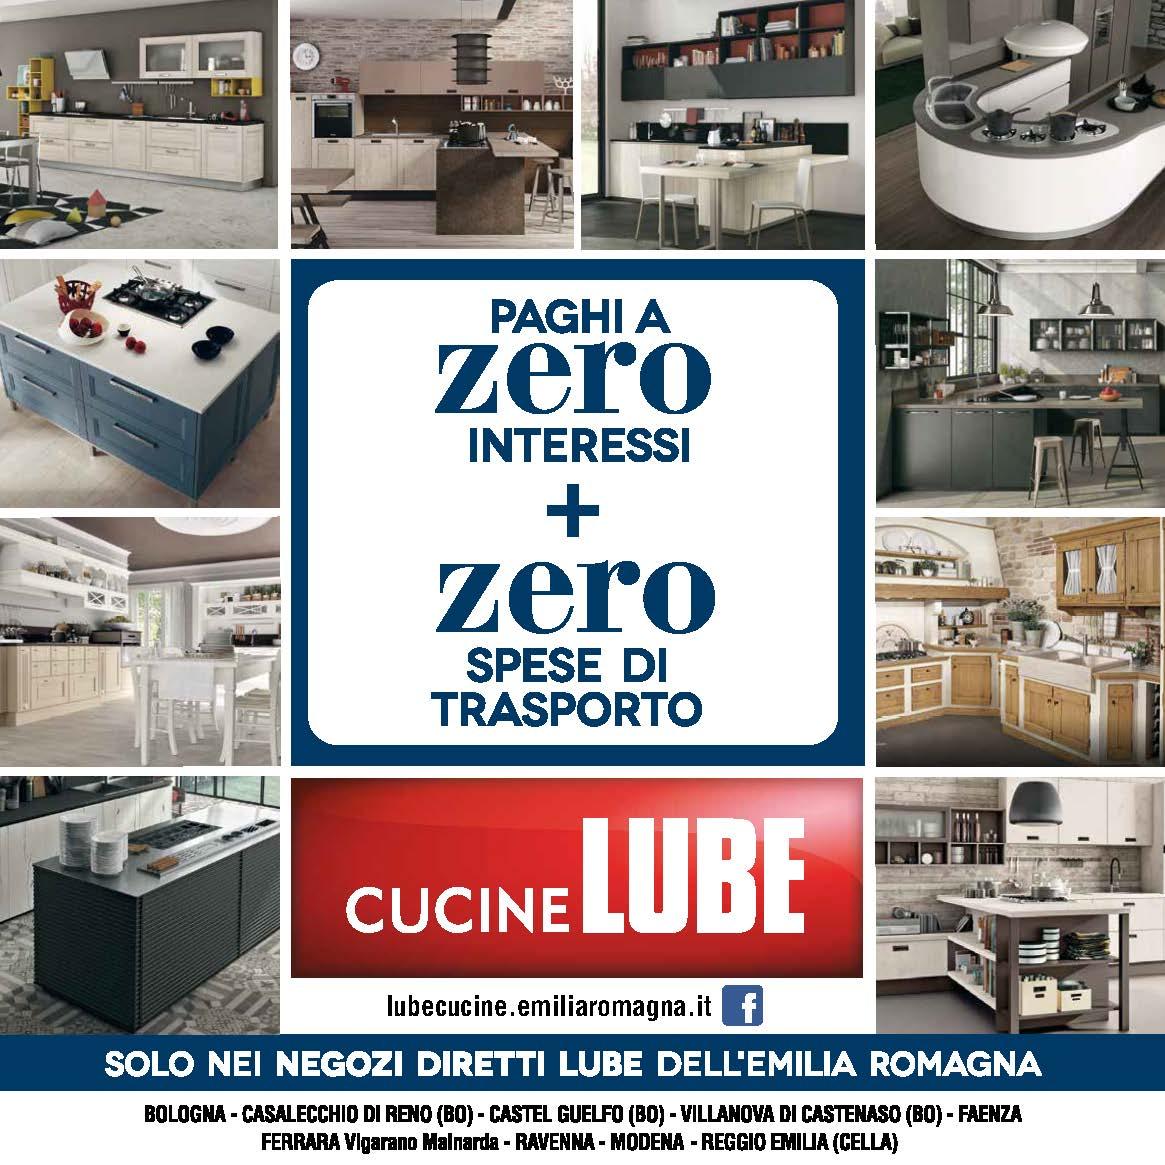 Lube cucine emilia romagna dondi home reggio emilia payshop payshop - Cucine lube reggio emilia ...